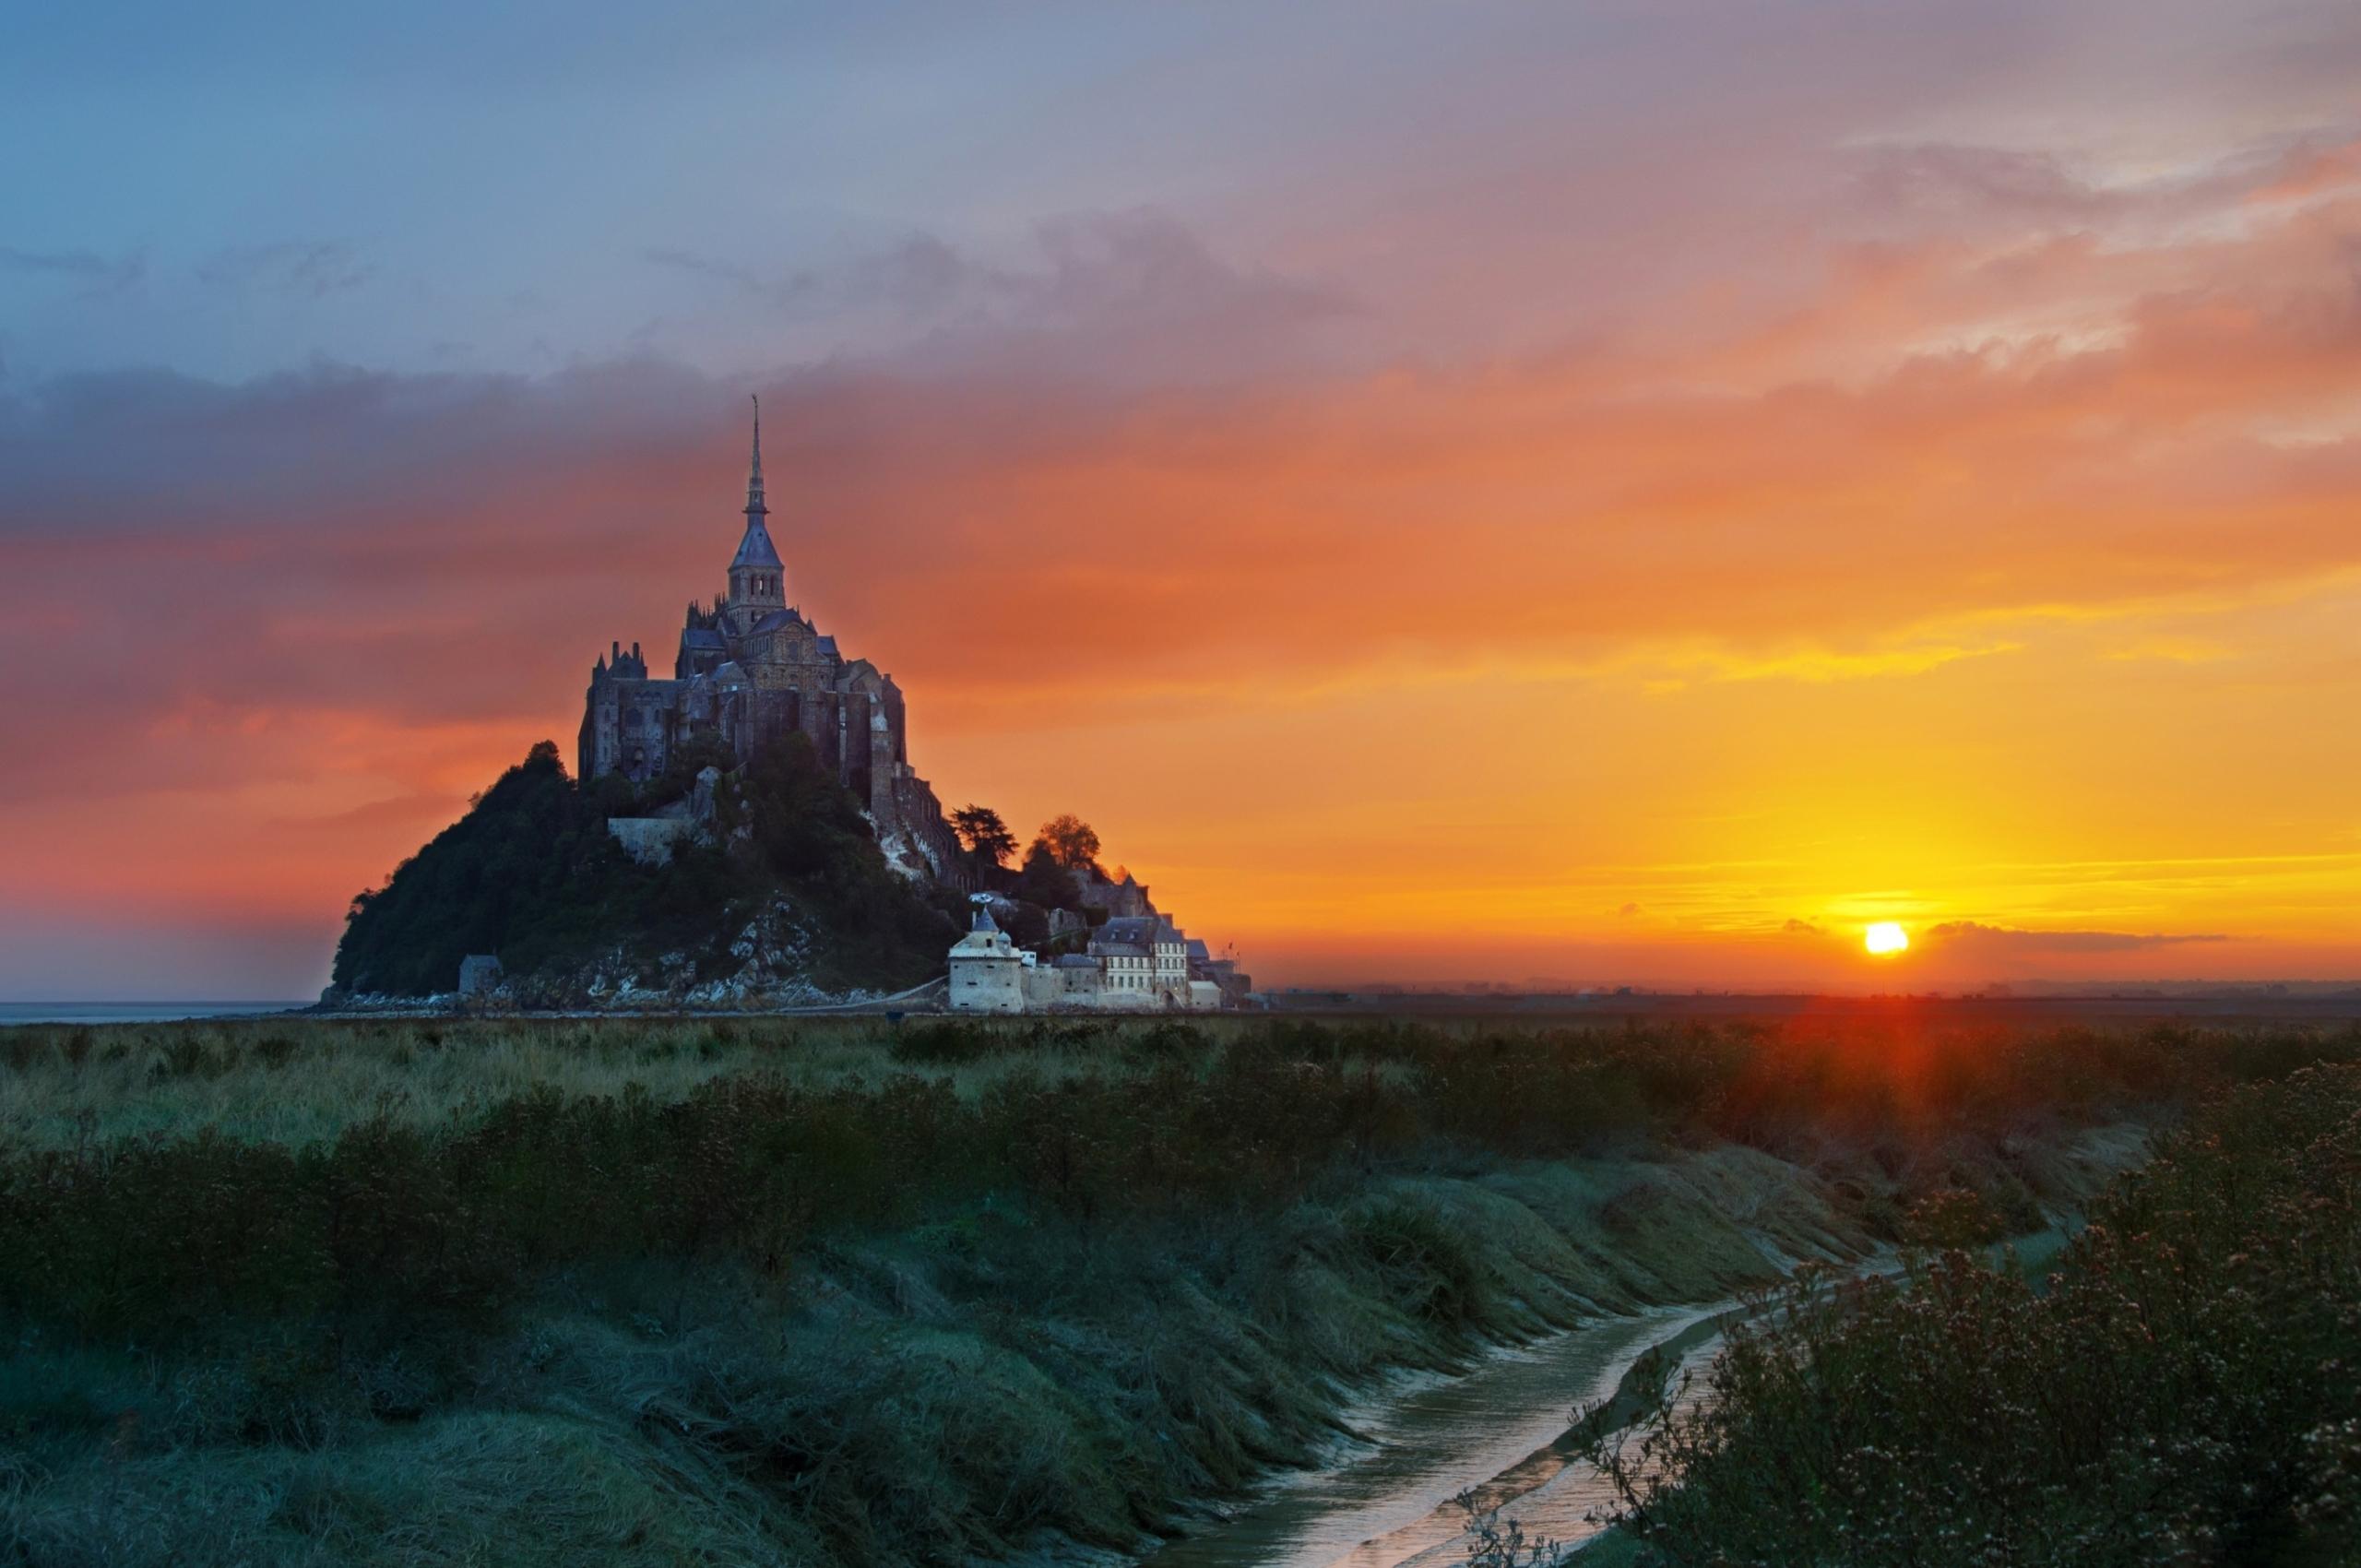 Mont Saint-Michel at Sunrise Wallpaper in 2560x1700 Resolution